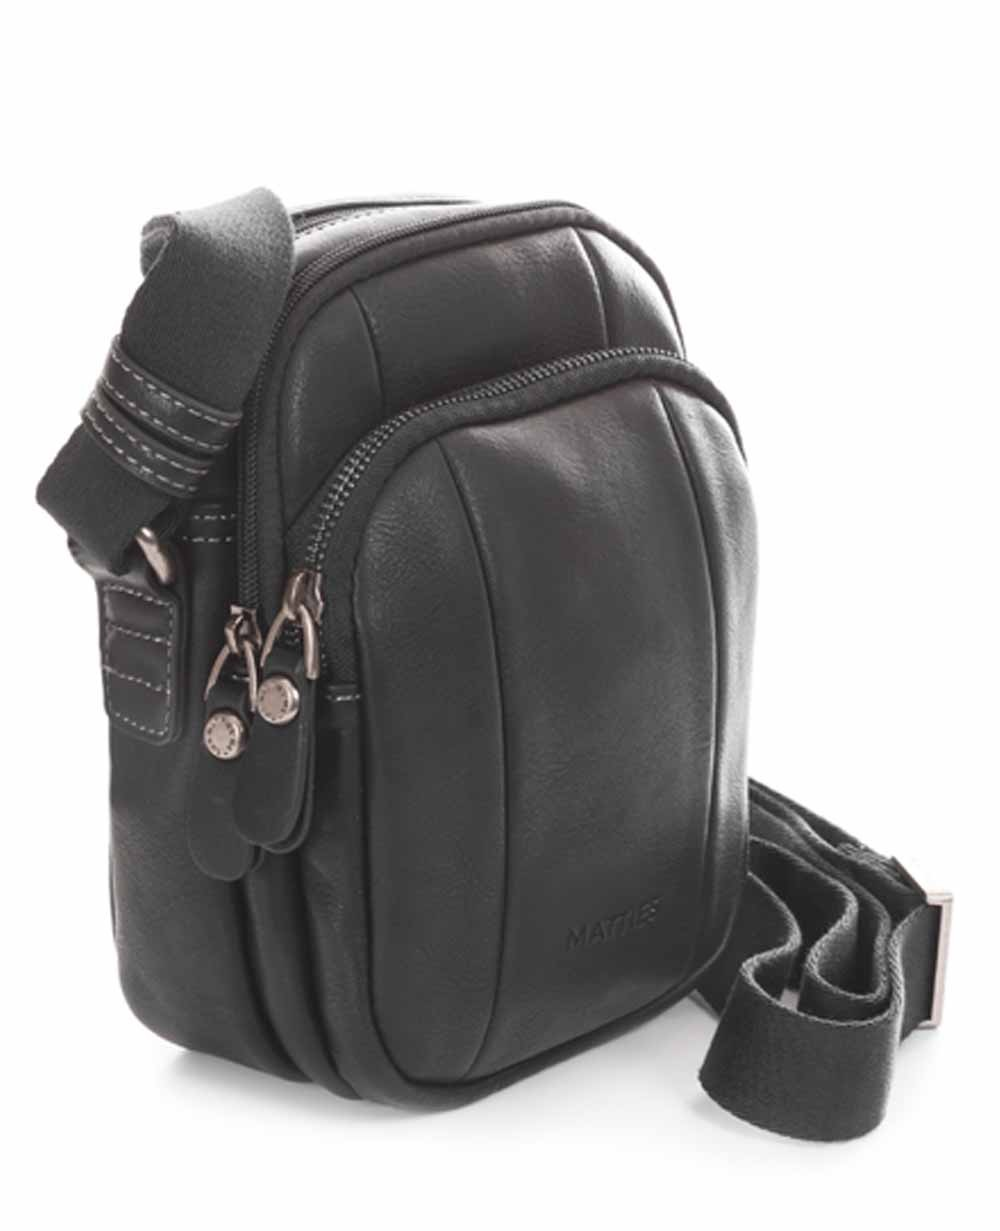 Matties Bags Bandolera Negra (Foto )